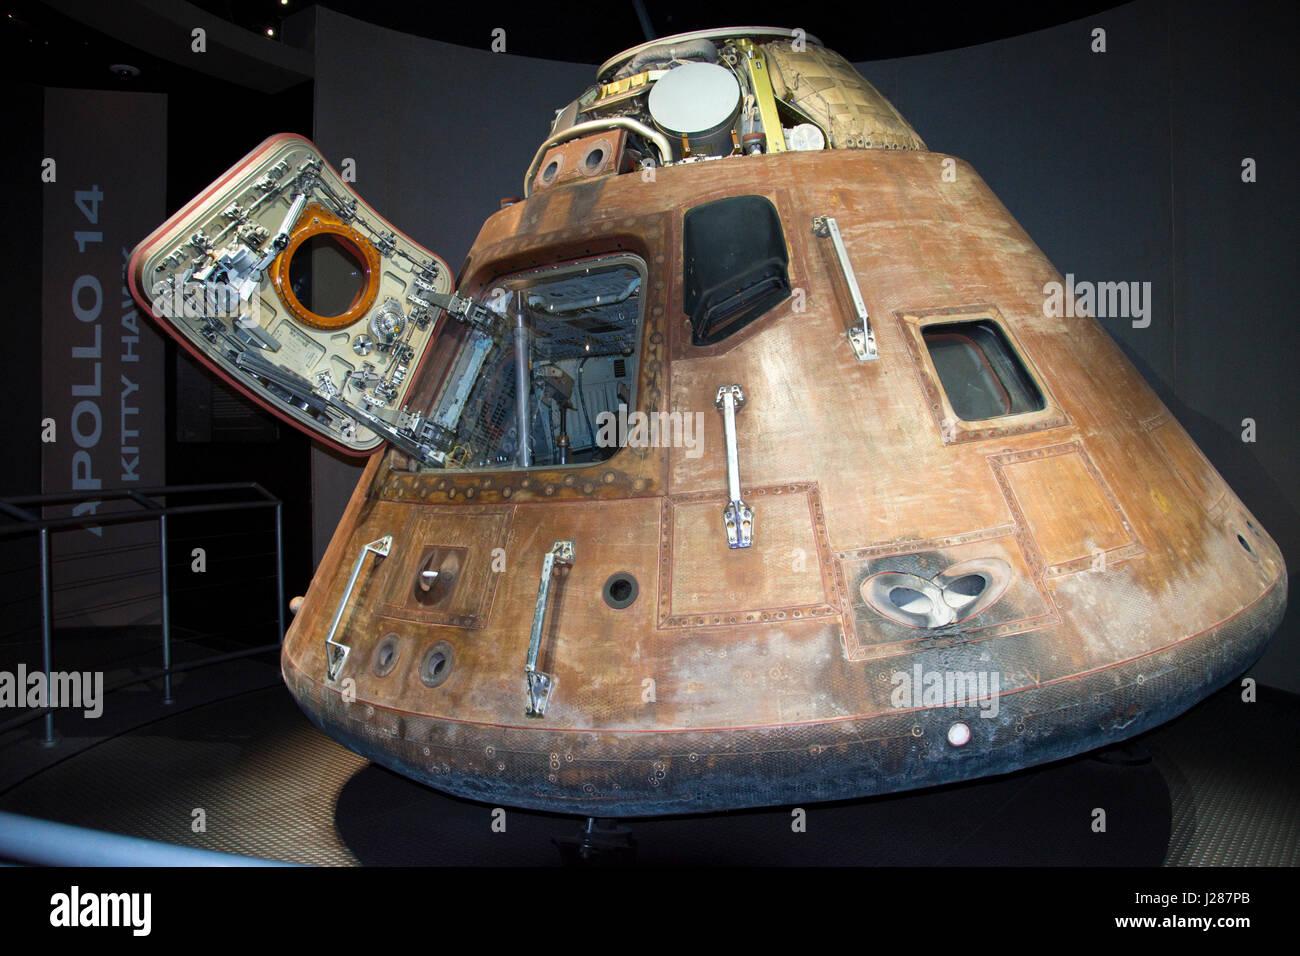 apollo spacecraft - photo #31